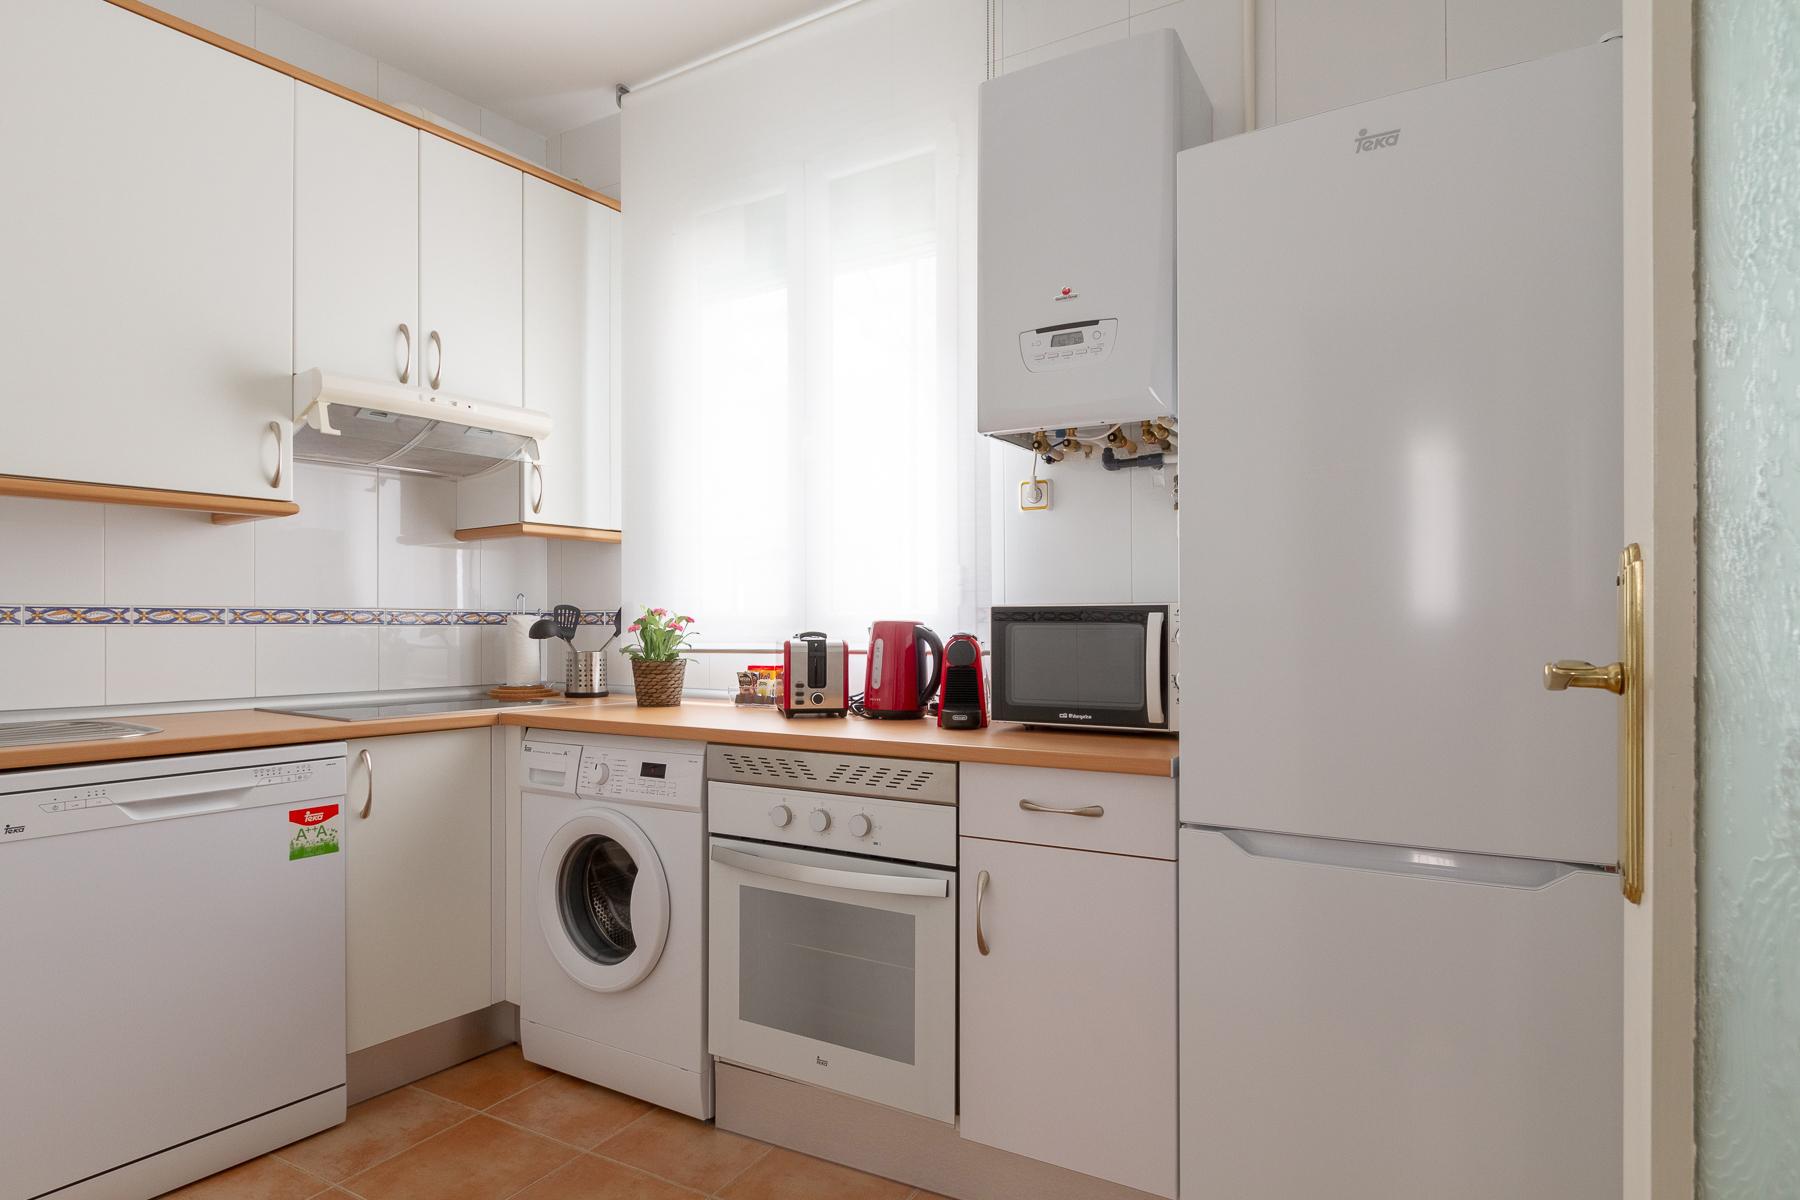 Kitchen at Fernan Gonzalez Apartments